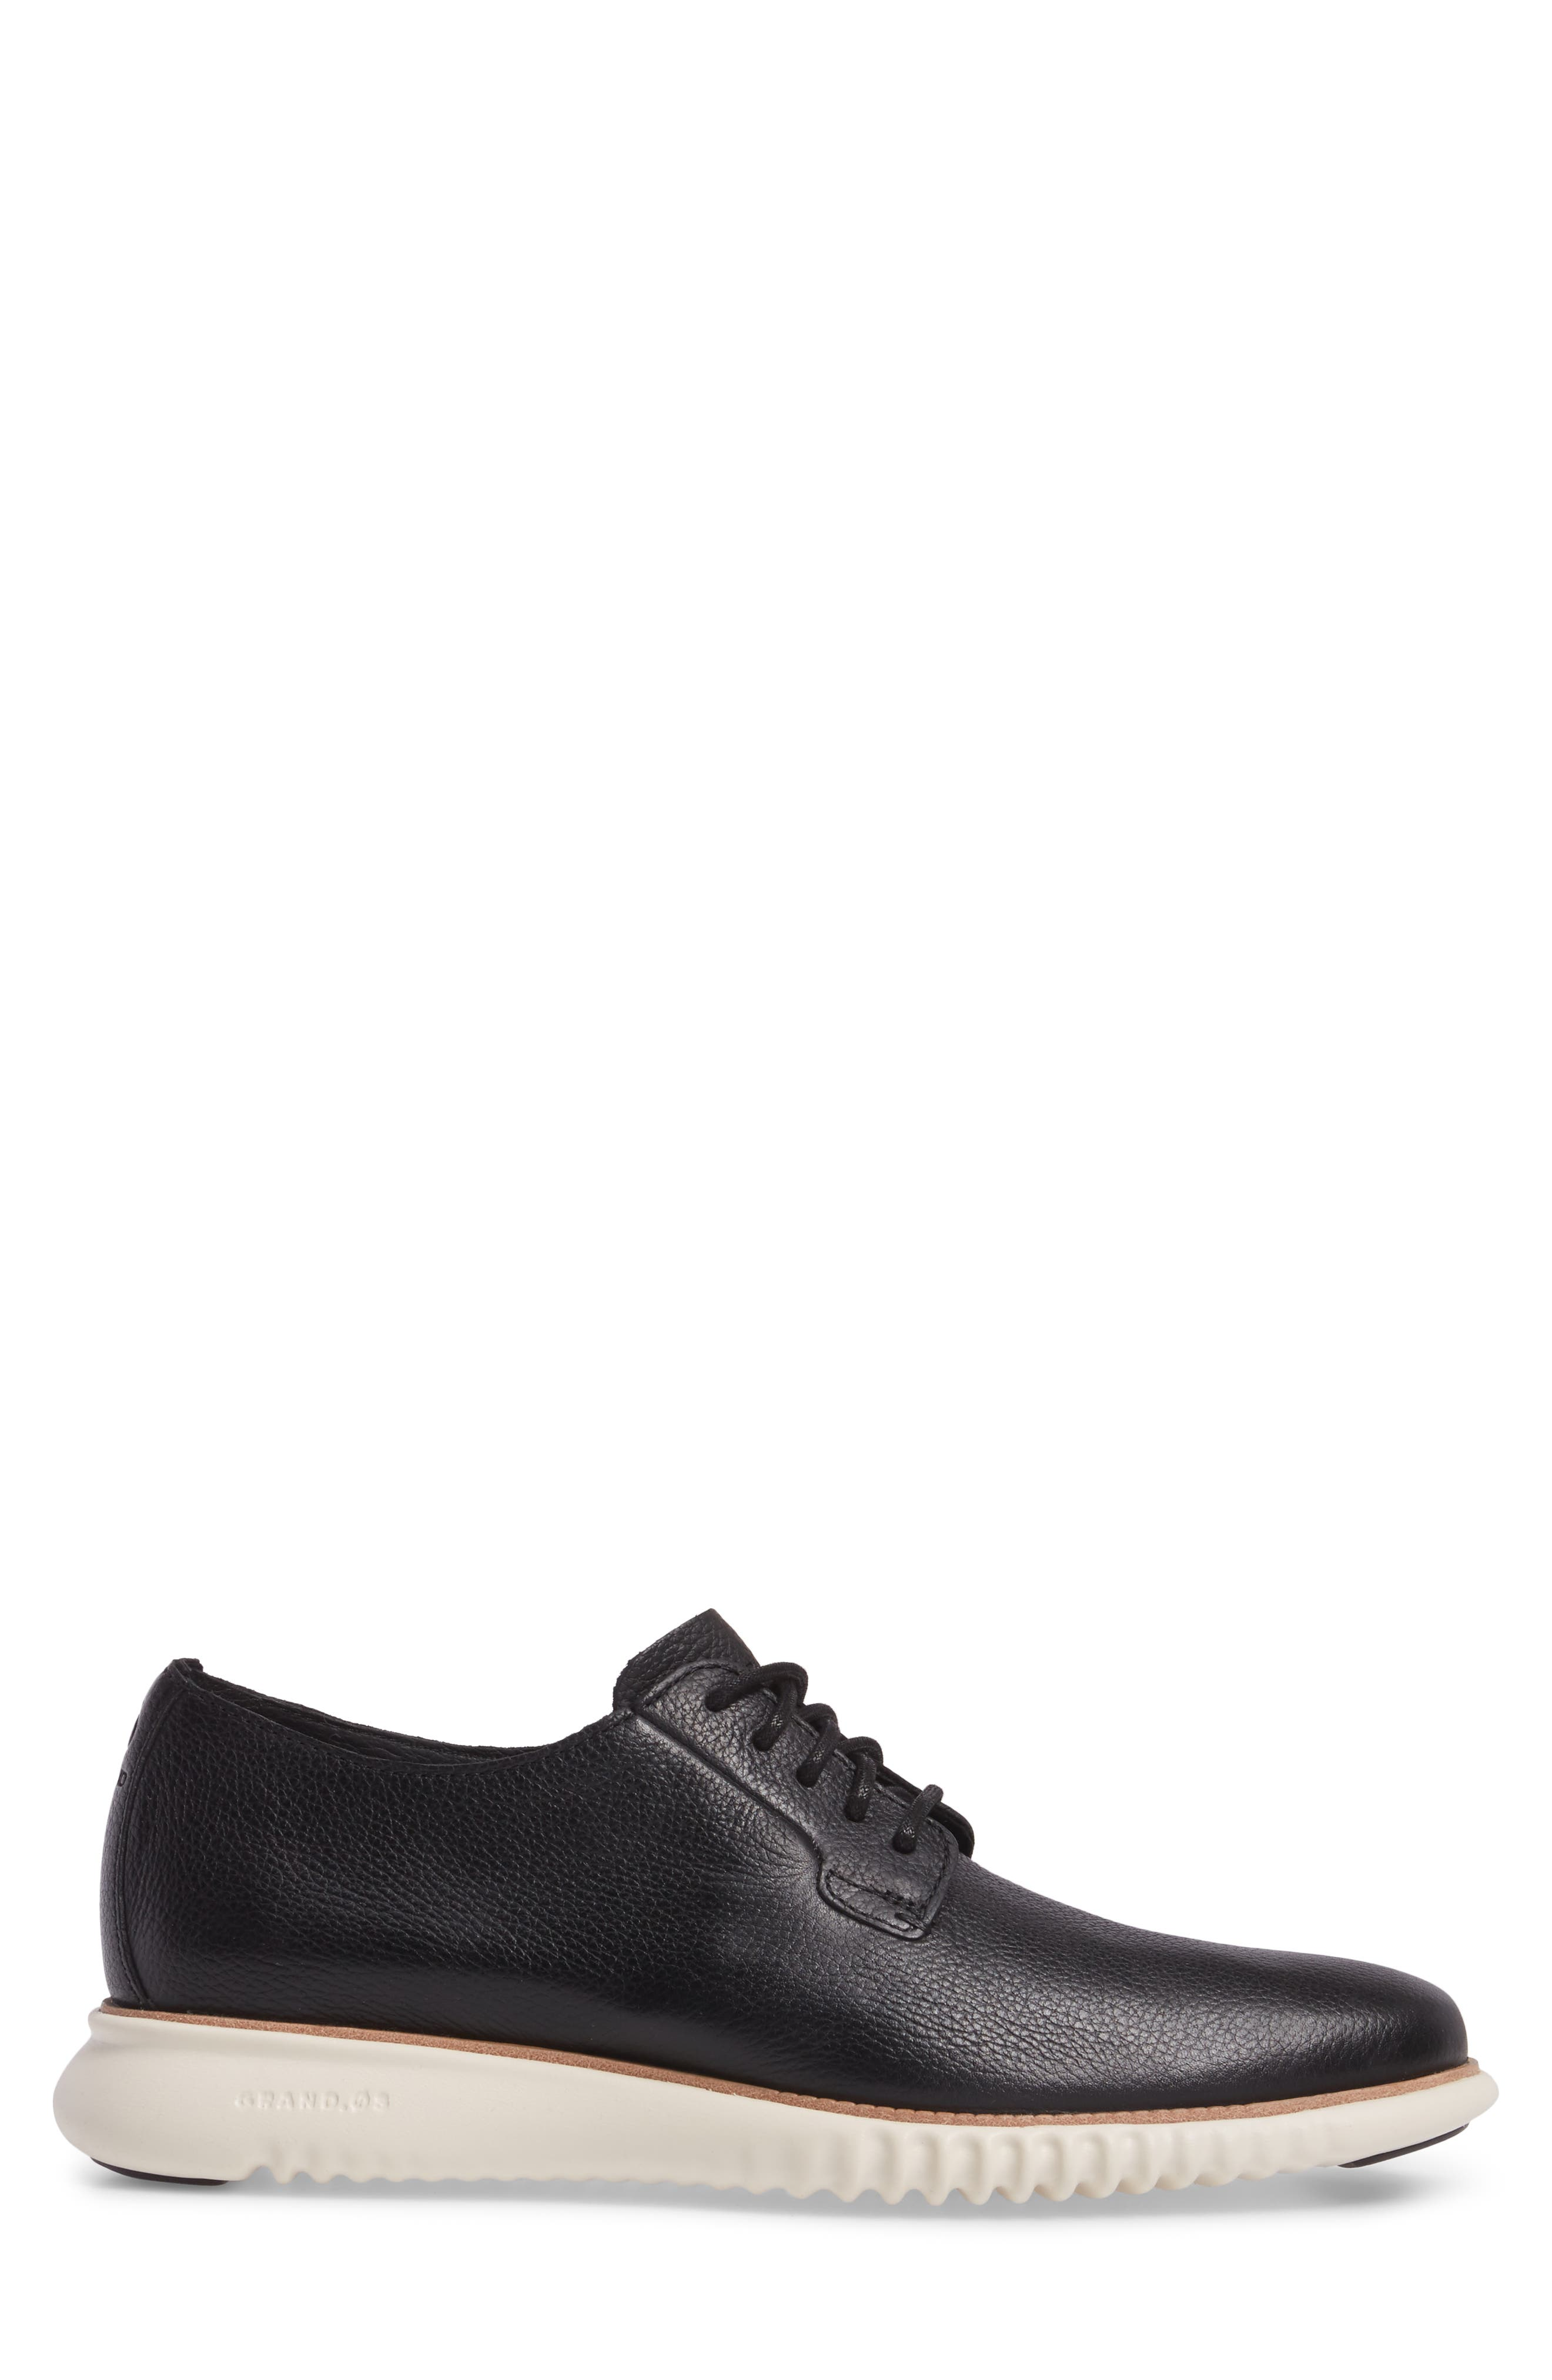 2.ZeroGrand Plain Toe Derby,                             Alternate thumbnail 3, color,                             Black/ Ivory Leather